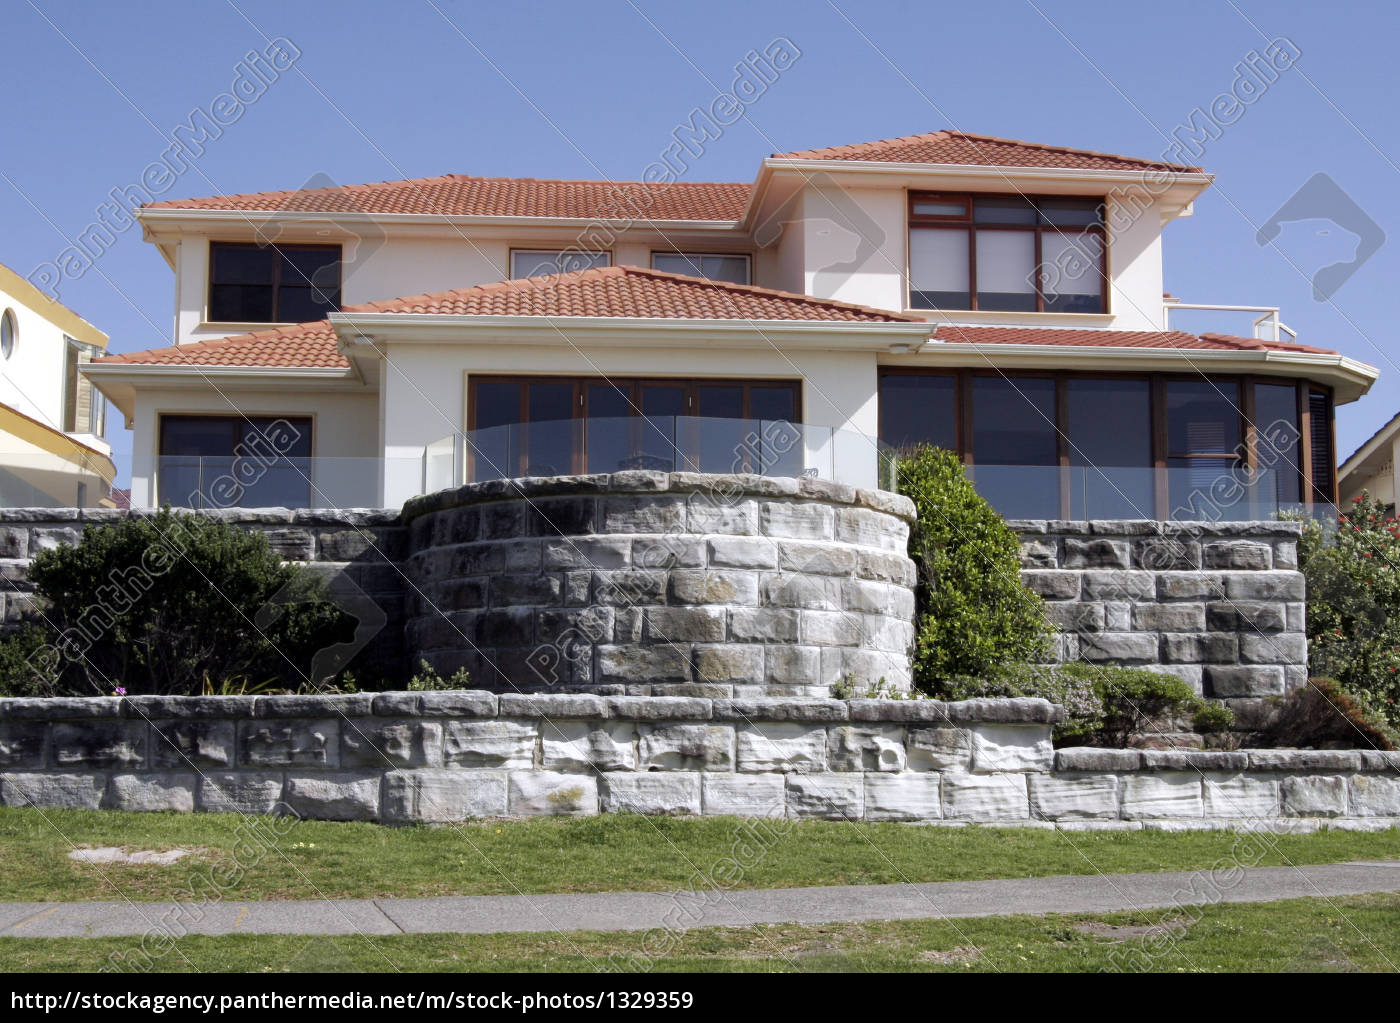 mansion - 1329359